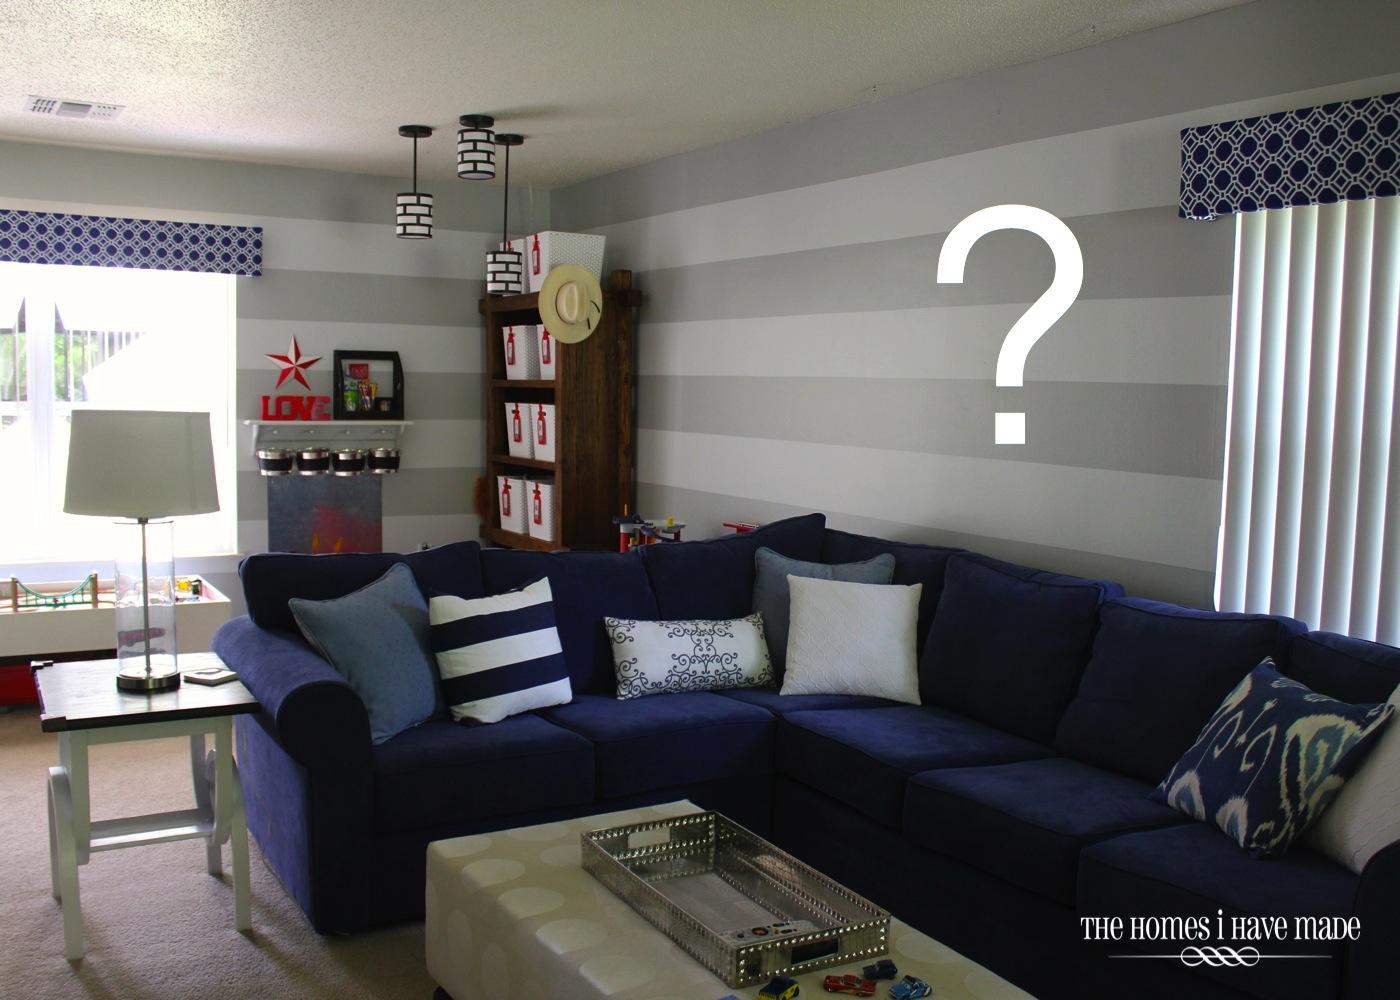 lighting in homes. Lighting In Homes